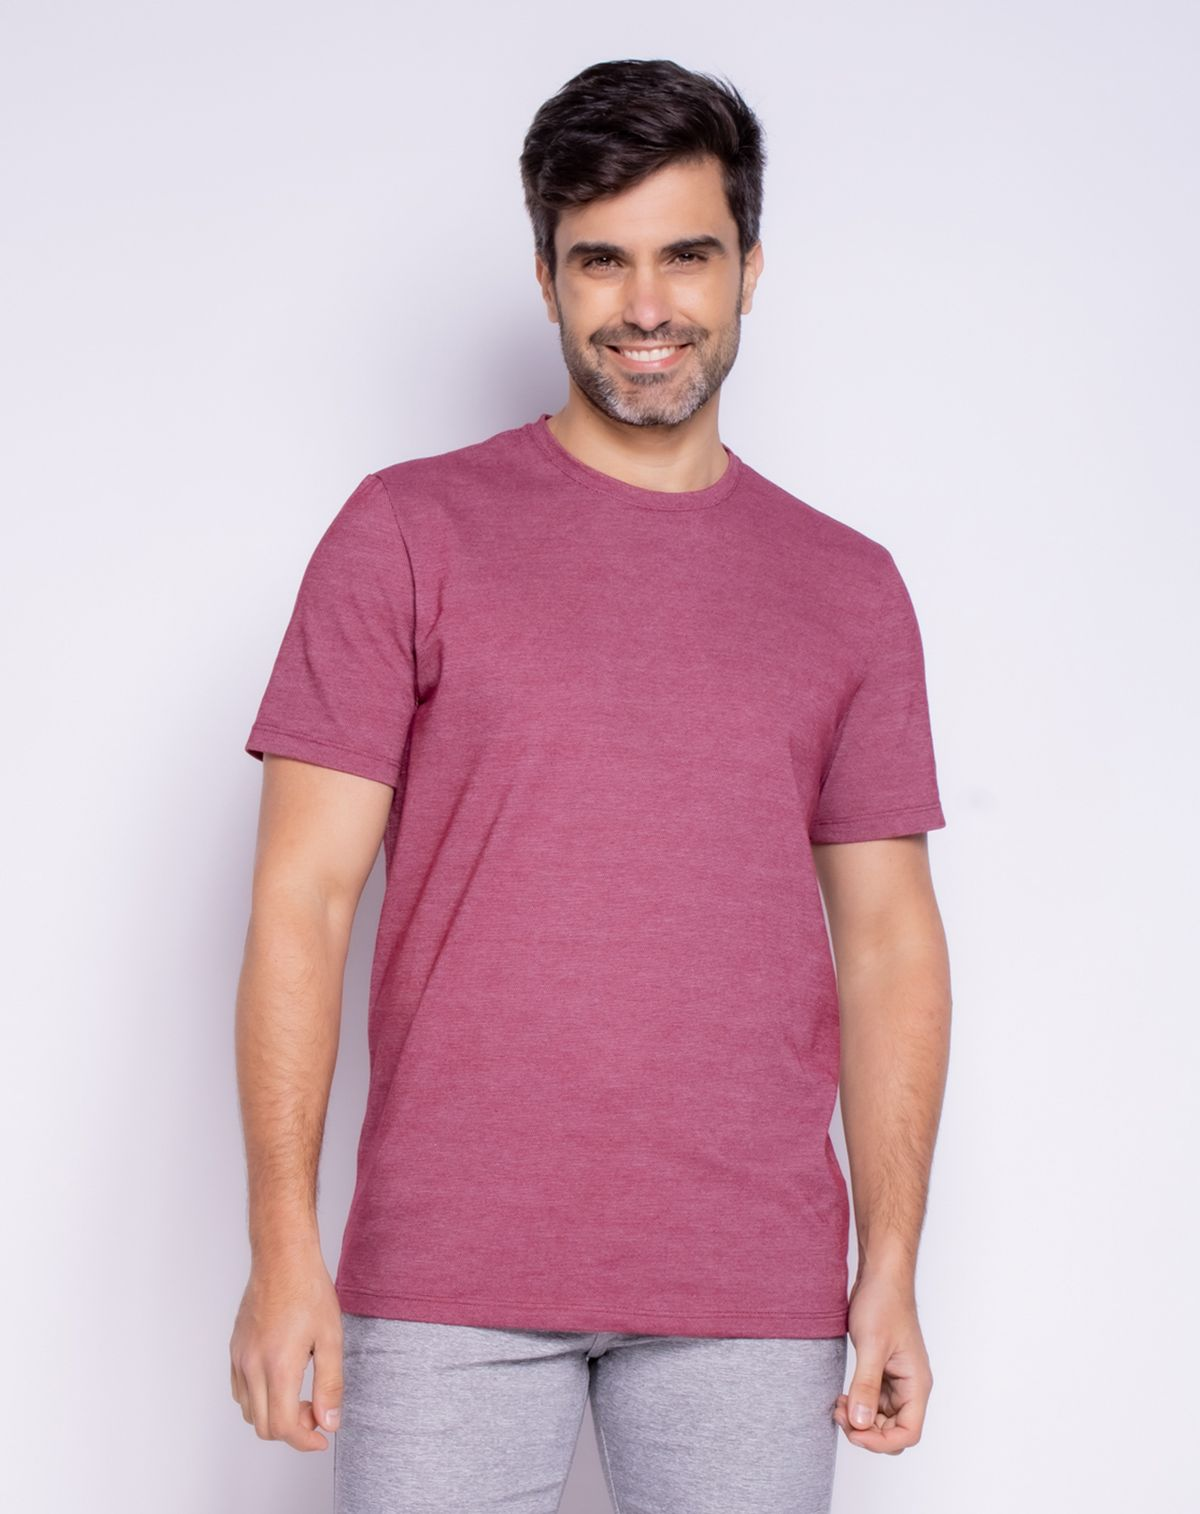 579809002-camiseta-basica-manga-curta-masculina-piquet-bordo-m-632